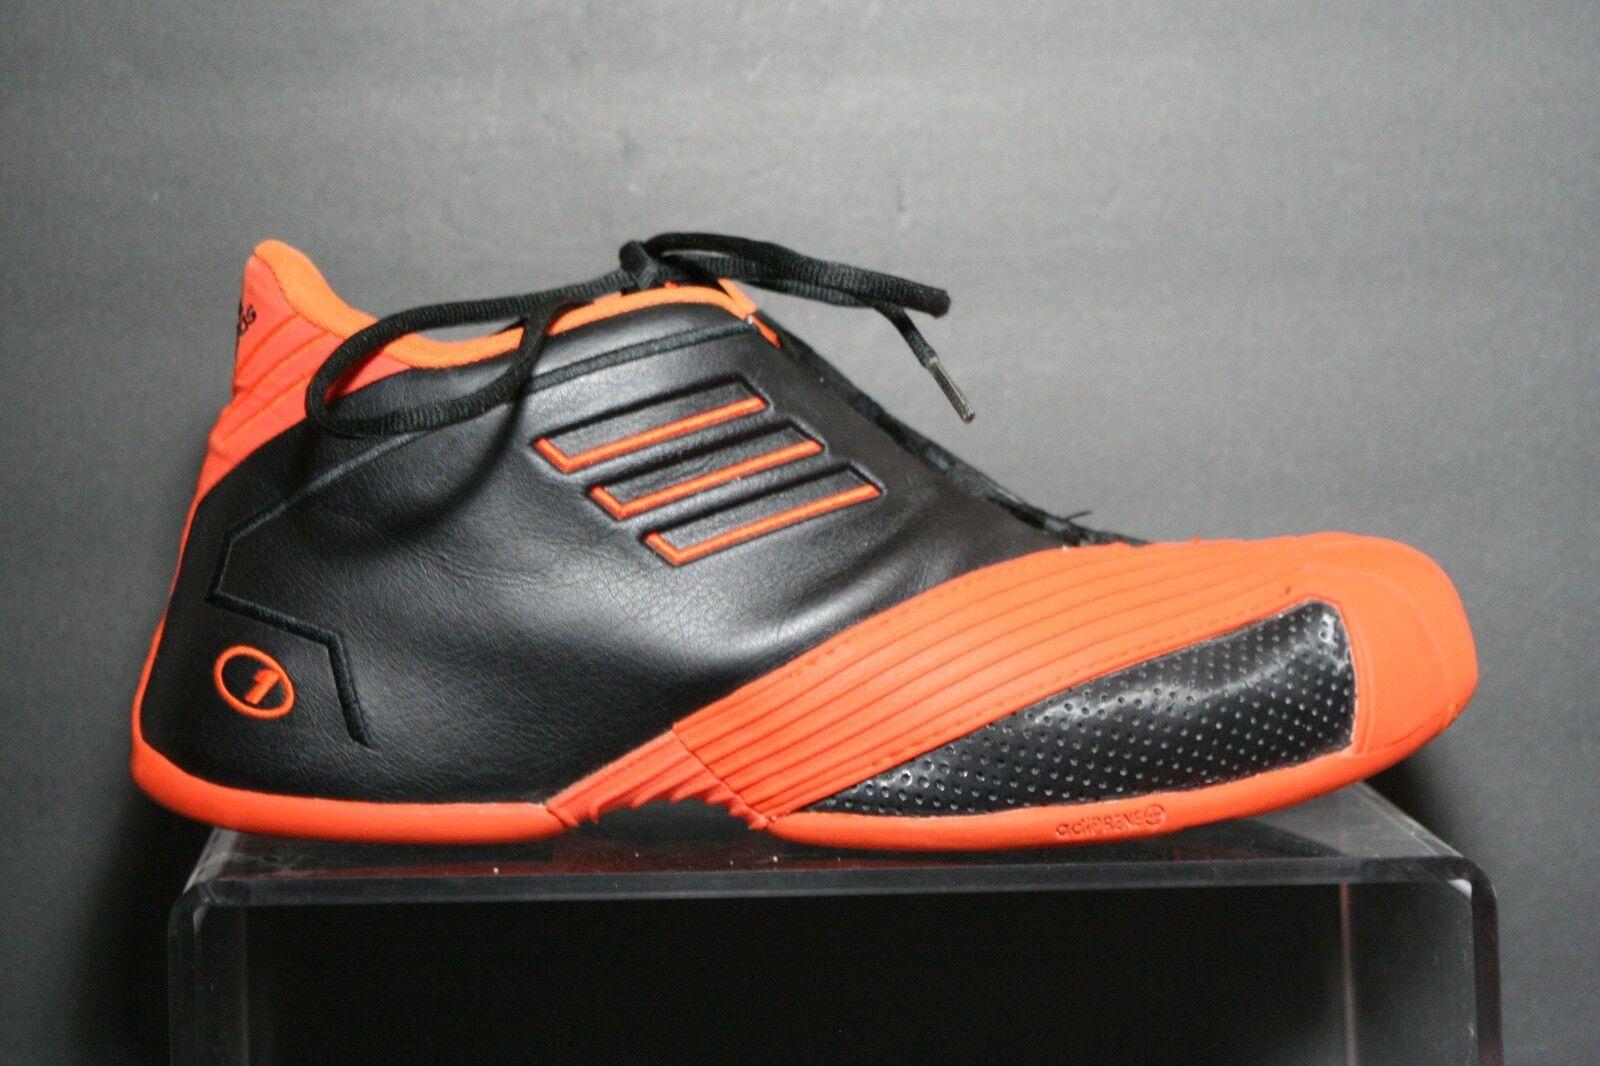 Adidas tmac mcgrady ripropone 2005 multi - halloween nero orange uomini 12 halloween - nba athletic e4fff2